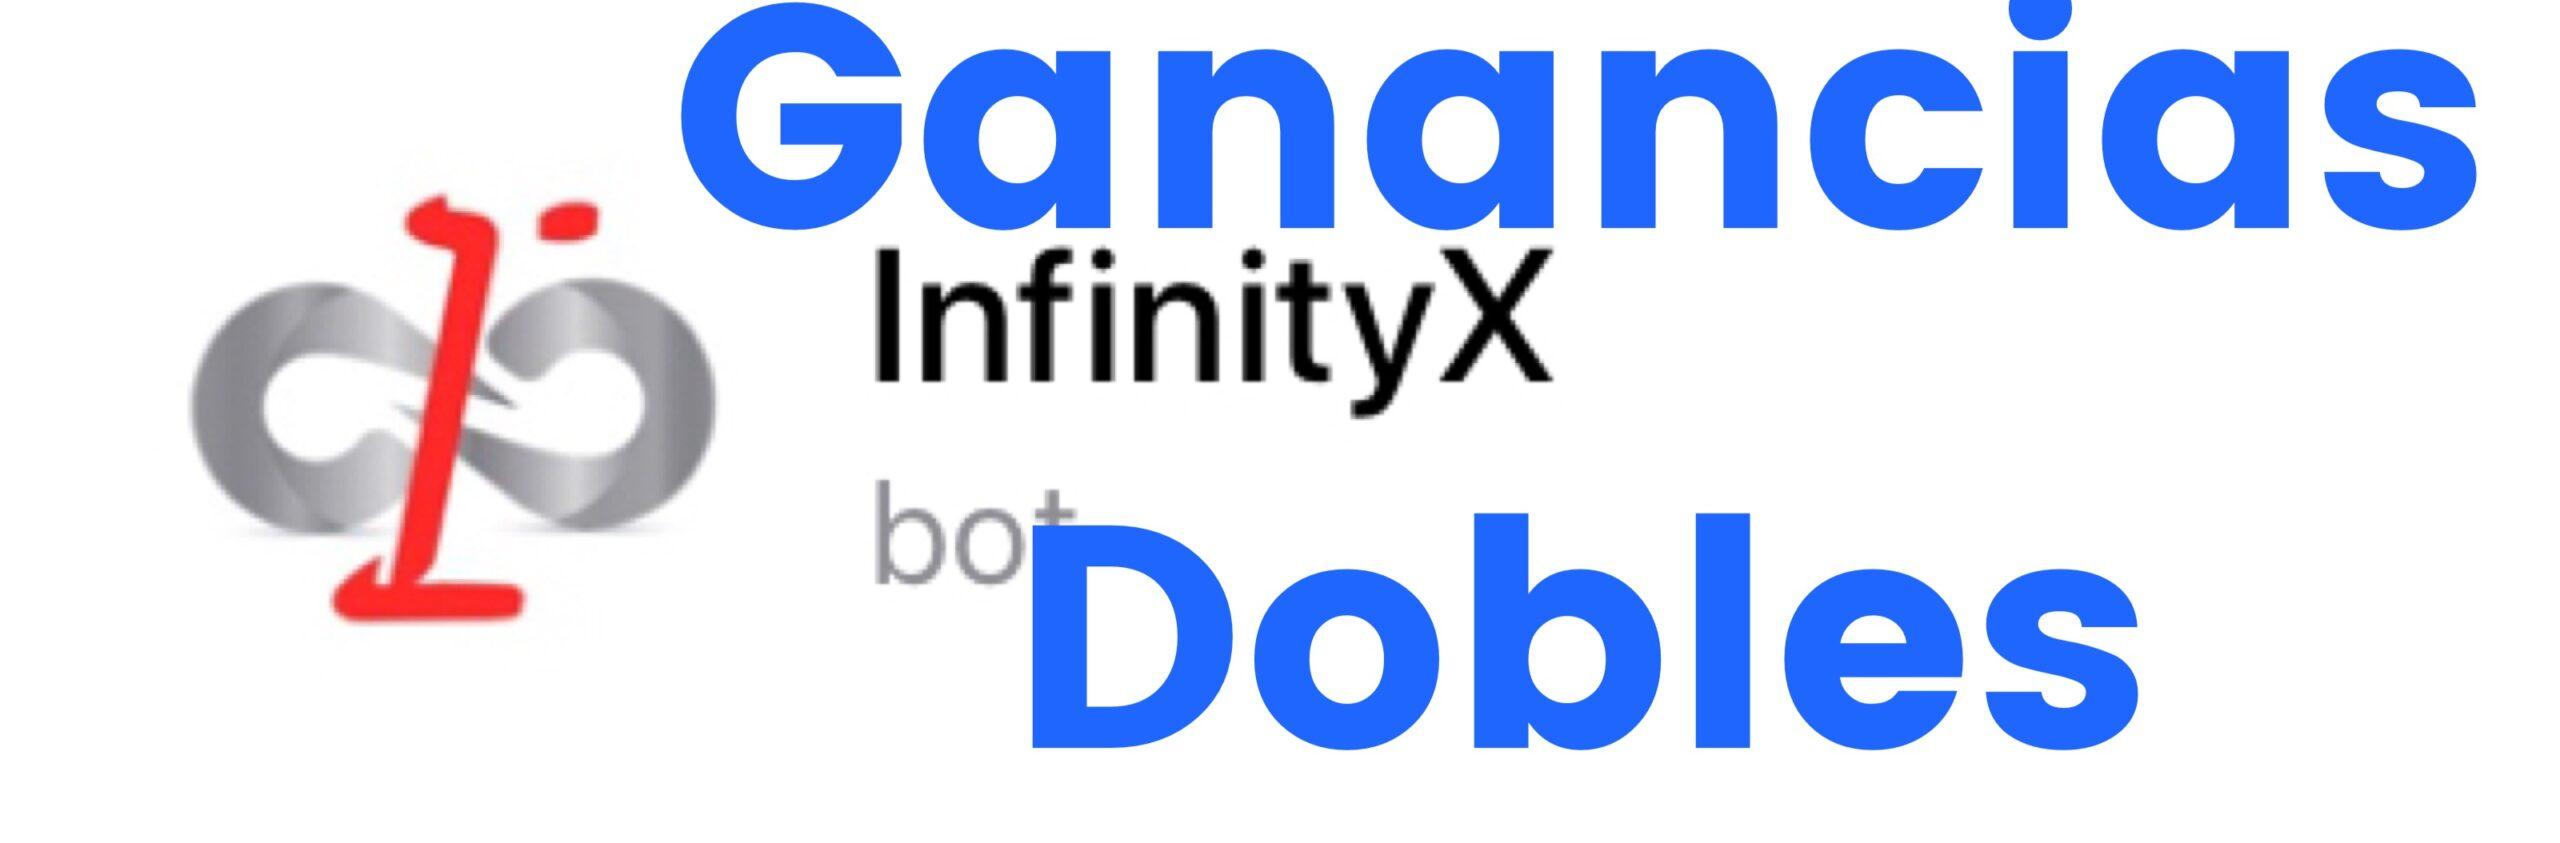 En este momento estás viendo Retiro en InfinityX *Tutorial*